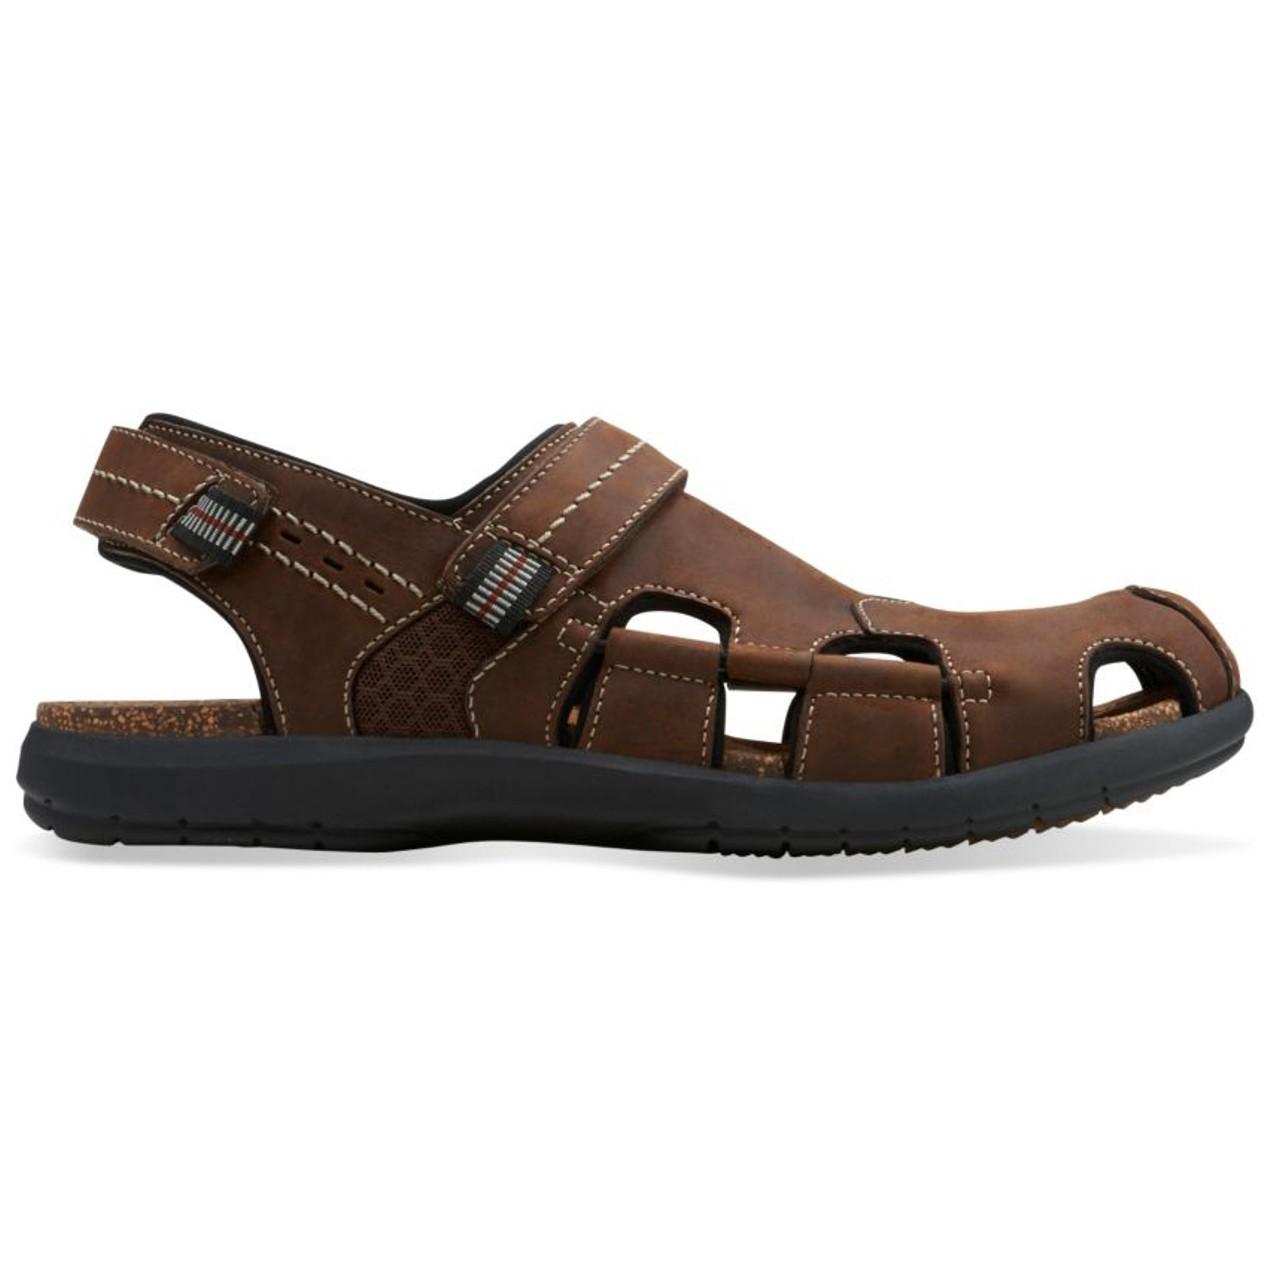 a12eb22f514 Clarks Mens Un.Bryman Bay Leather Sandal - Assorted Colors - Tanga